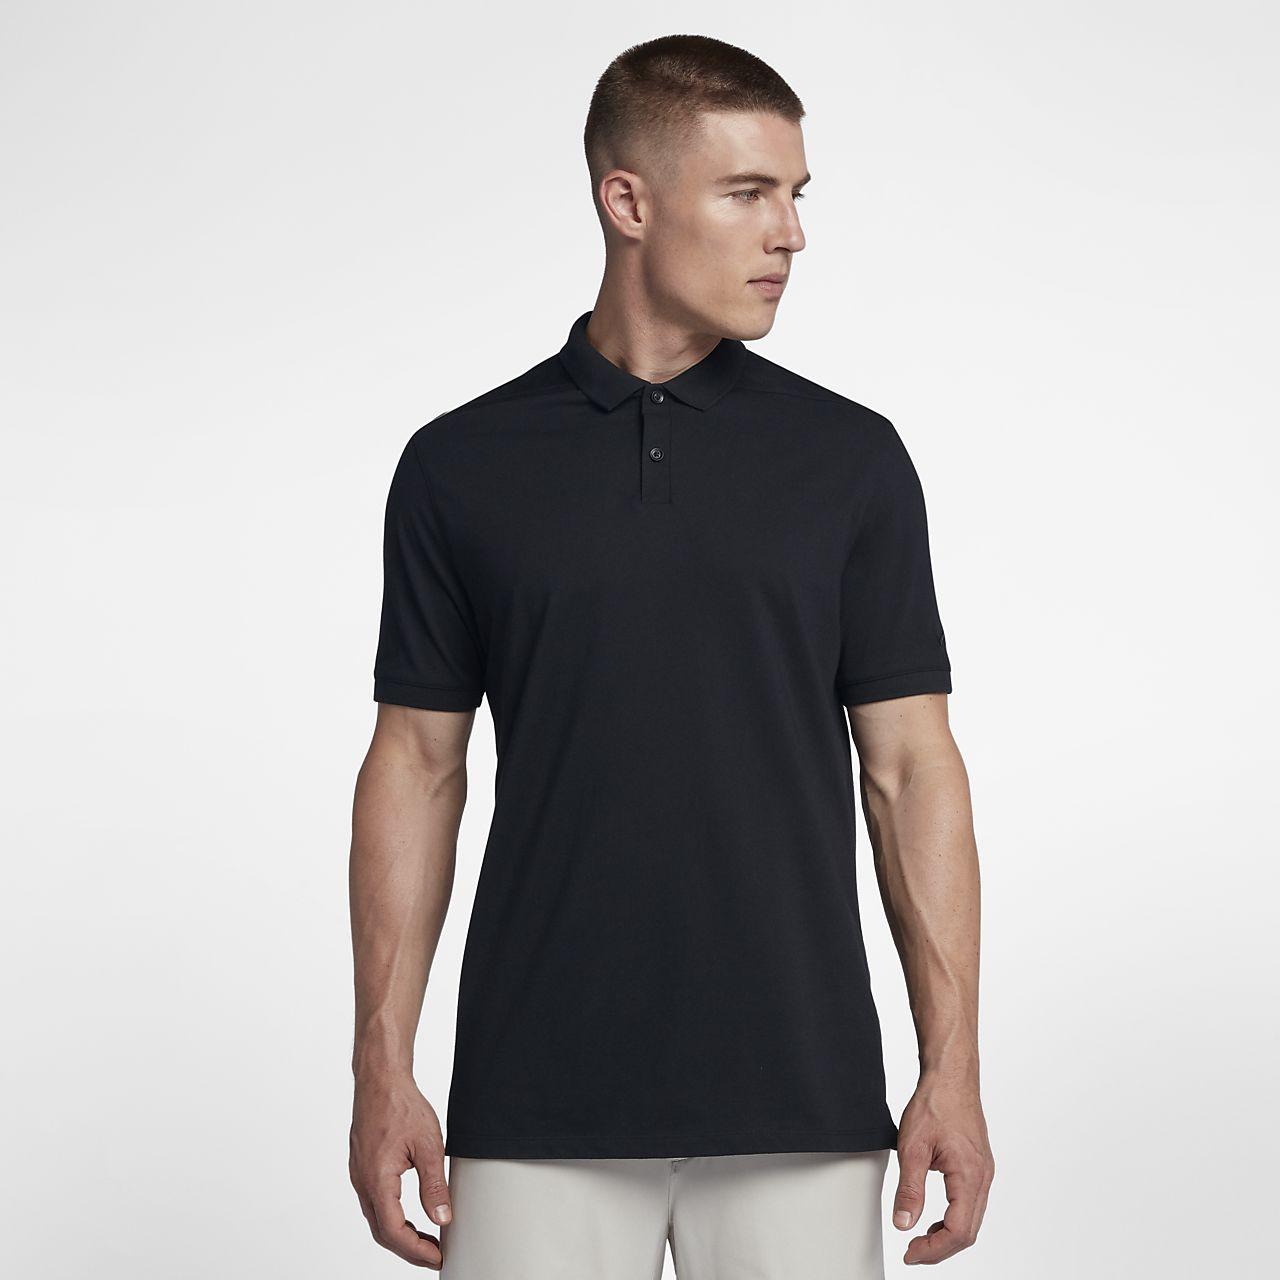 d4acbdf1239832 Nike Dri-FIT Golf-Poloshirt für Herren. Nike.com AT